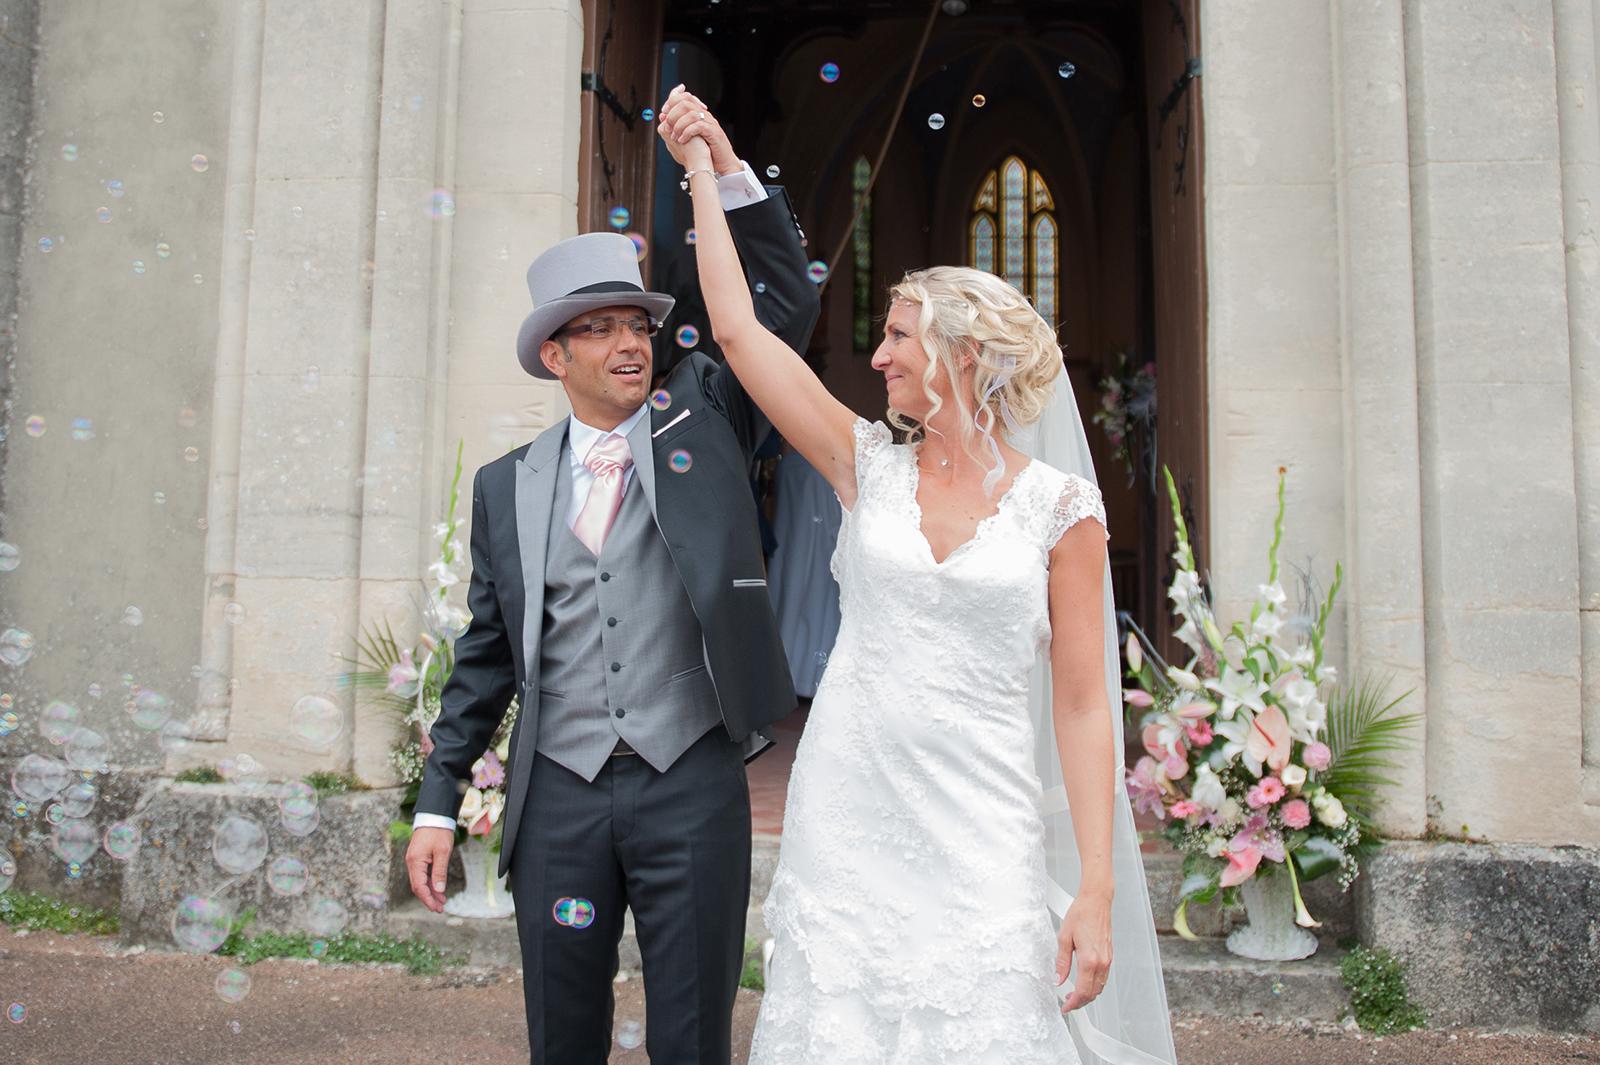 Peggy-Victor-photo-mariage-sabrina-godemert-photographe-seine-et-marne079